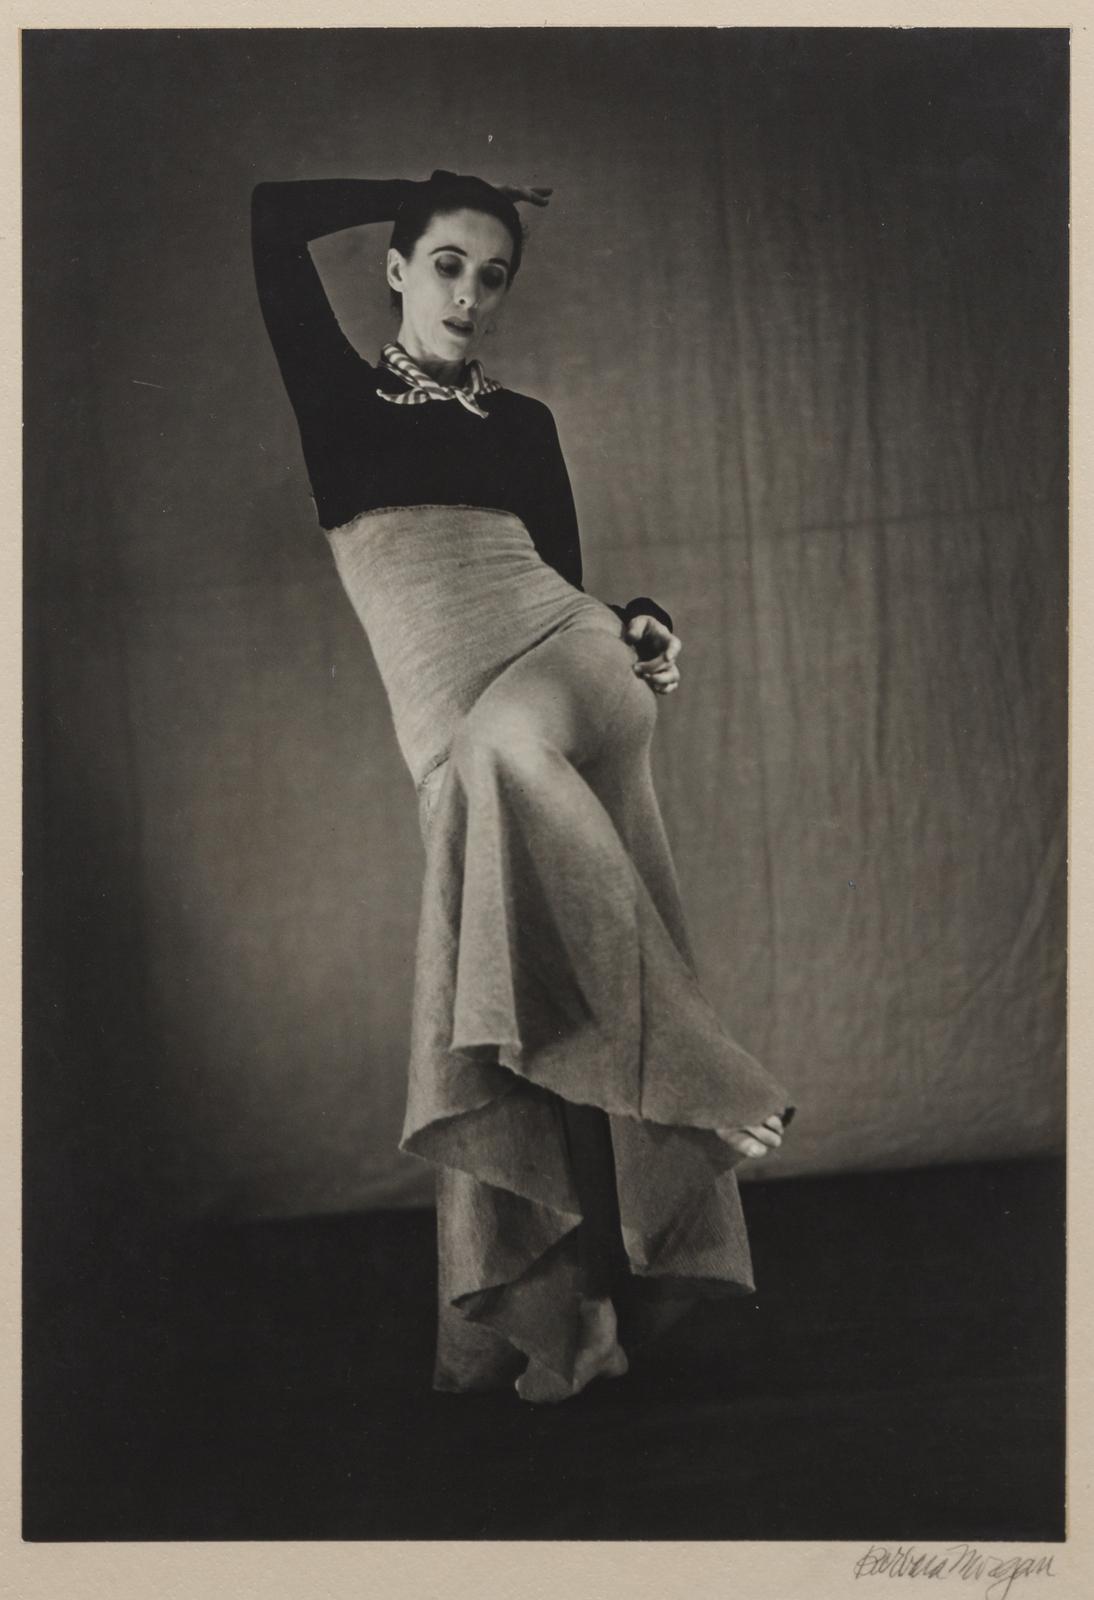 Barbara Morgan. Martha Graham - Cante jondo, 1937 © Barbara Morgan